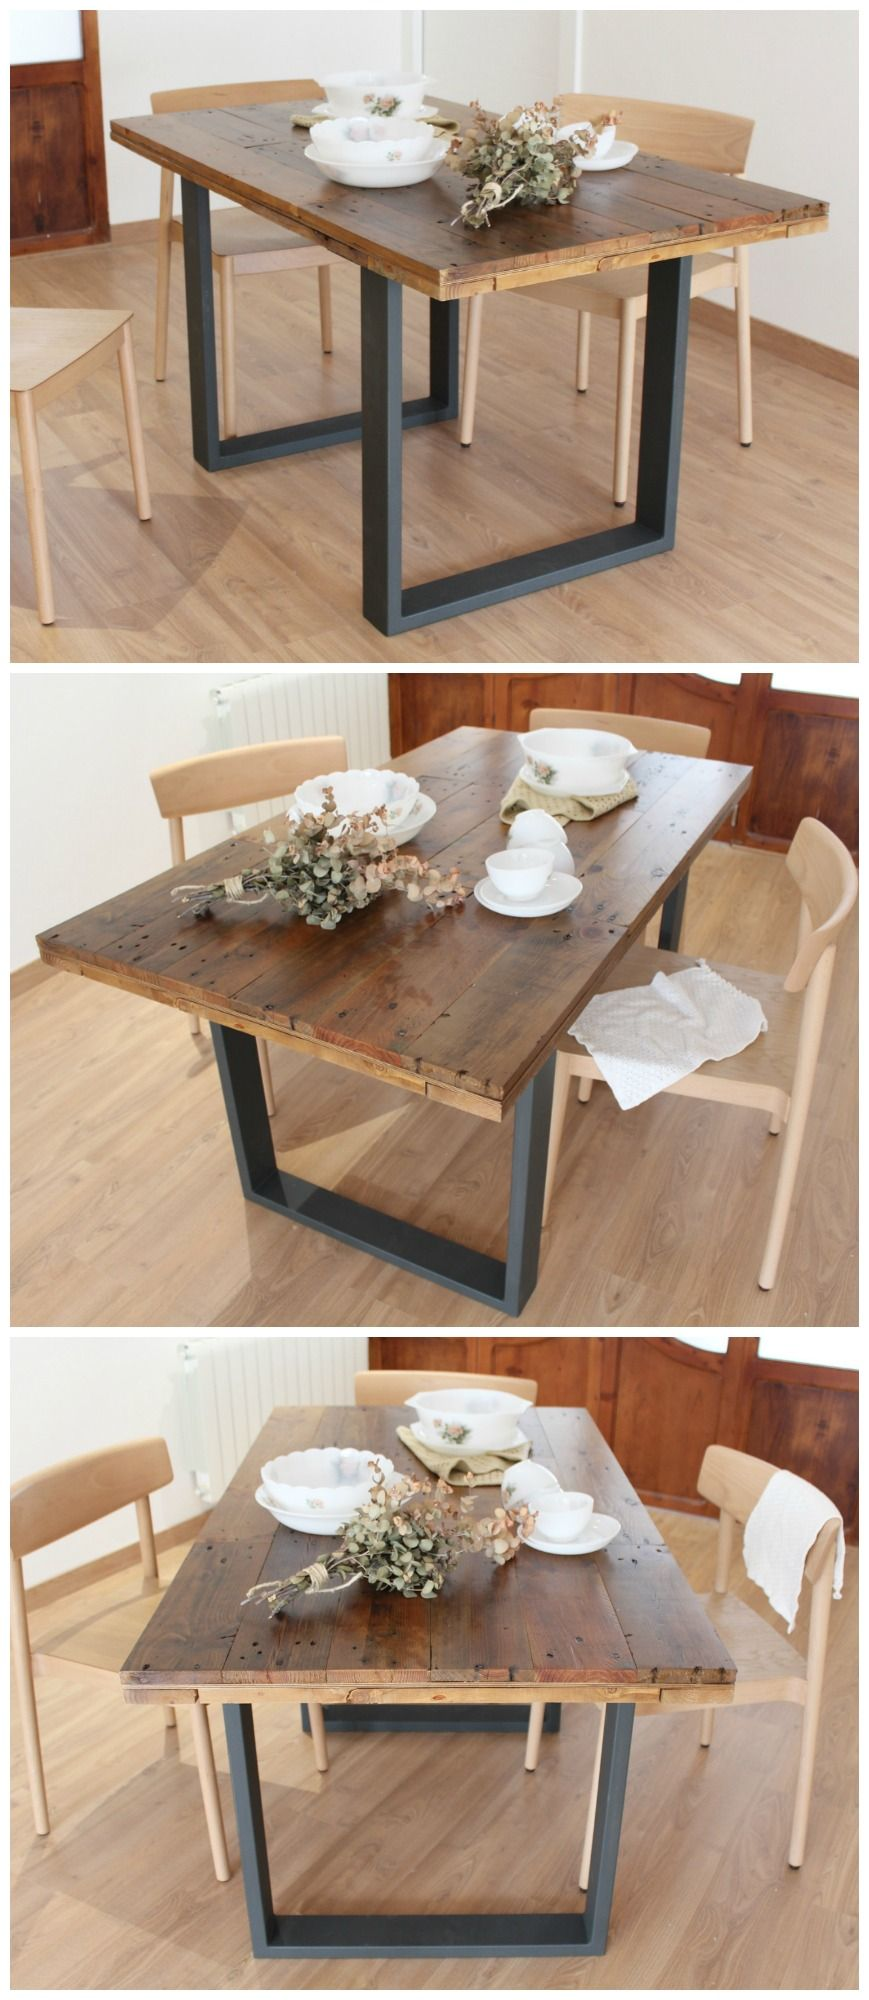 ALCAZABA mesa de comedor | Mesas de madera reciclada, Mesa ...